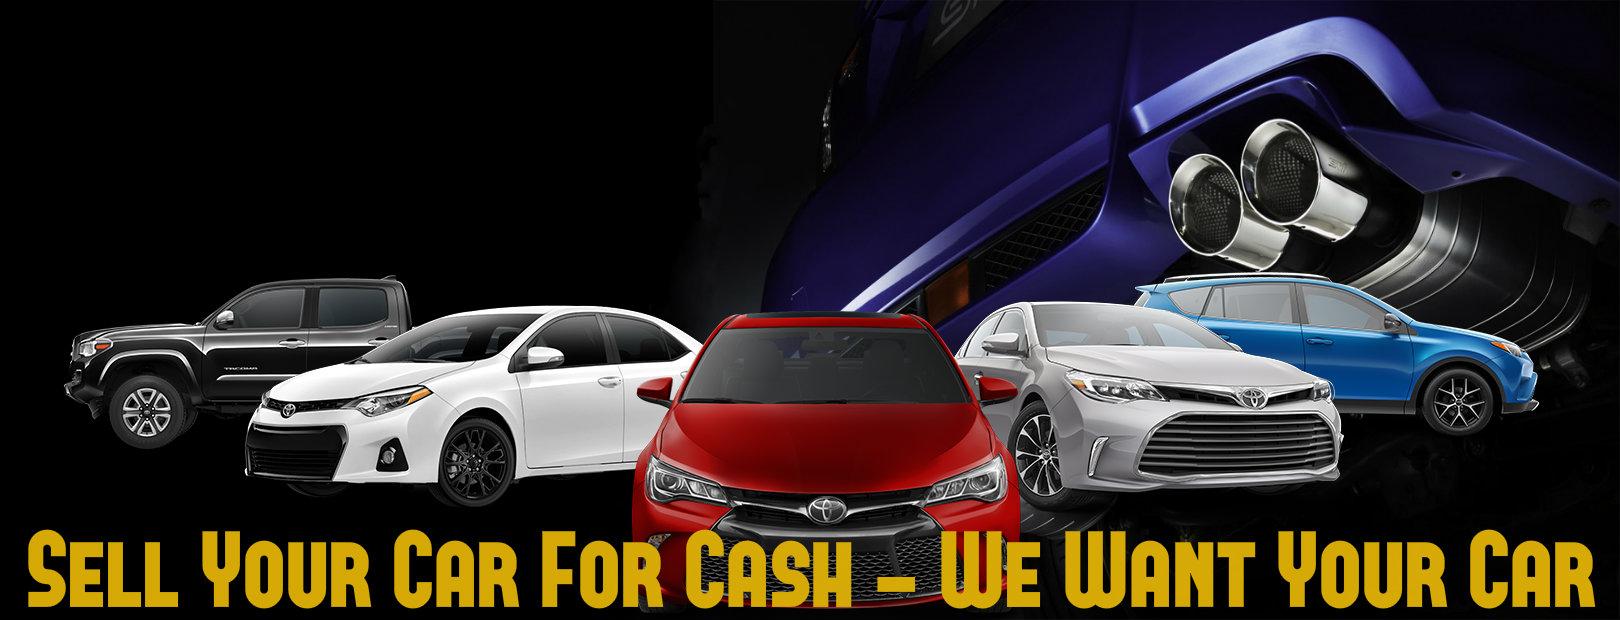 Used Car Buyers Sydney, We Come to You, Cash Car Dealer Sydney